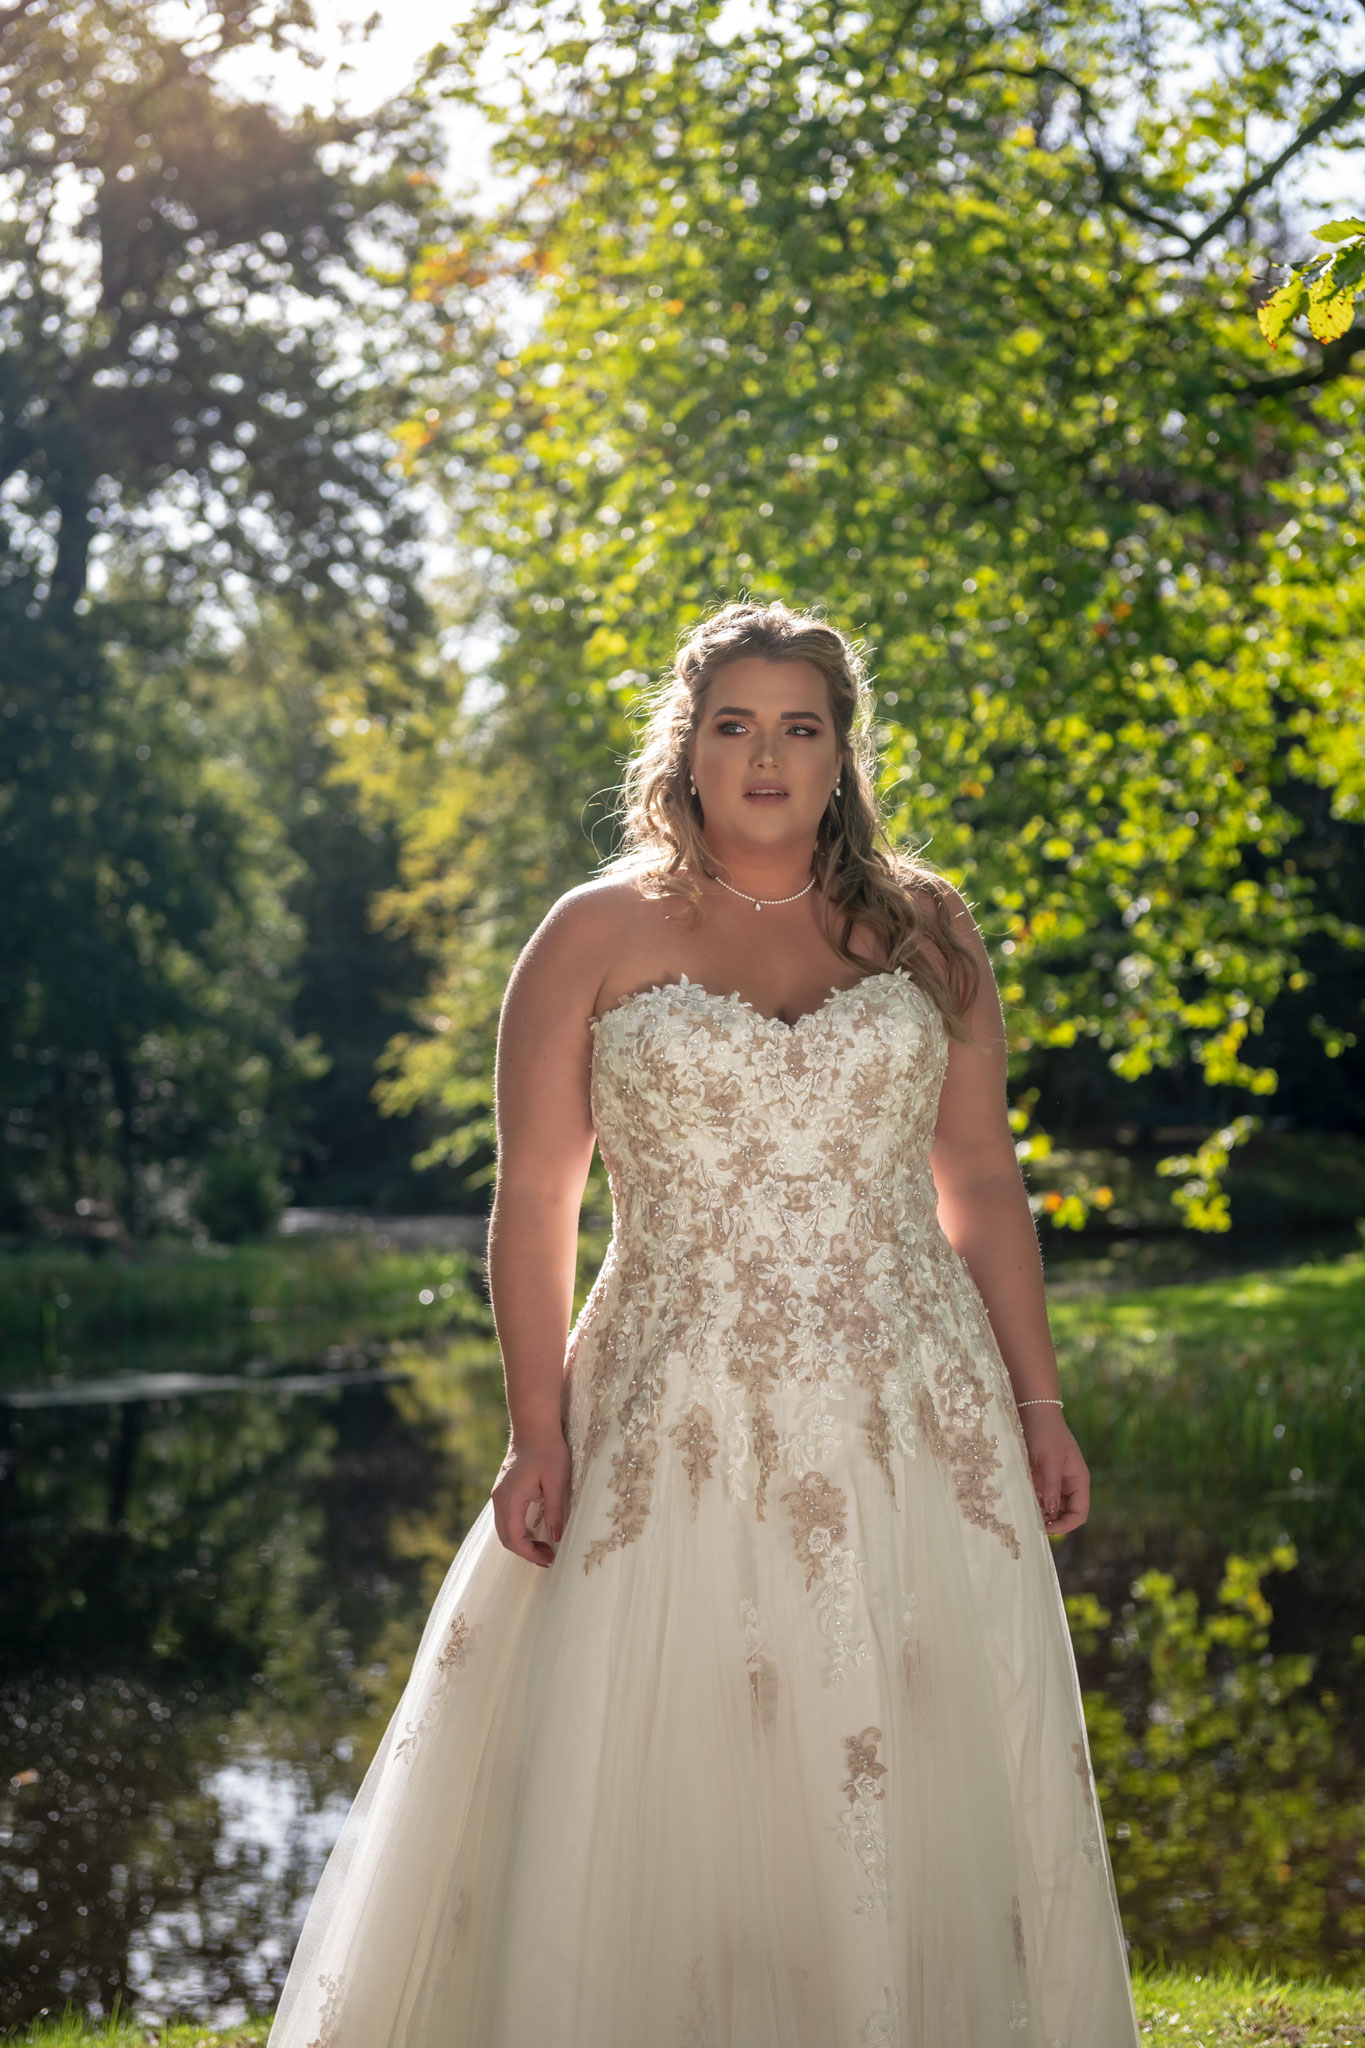 trägerlos Brautkleid Farbe Peach ivory Bridal Star Tüll Verlauf Korsage myLovely Curvy Prinzessin Tüll